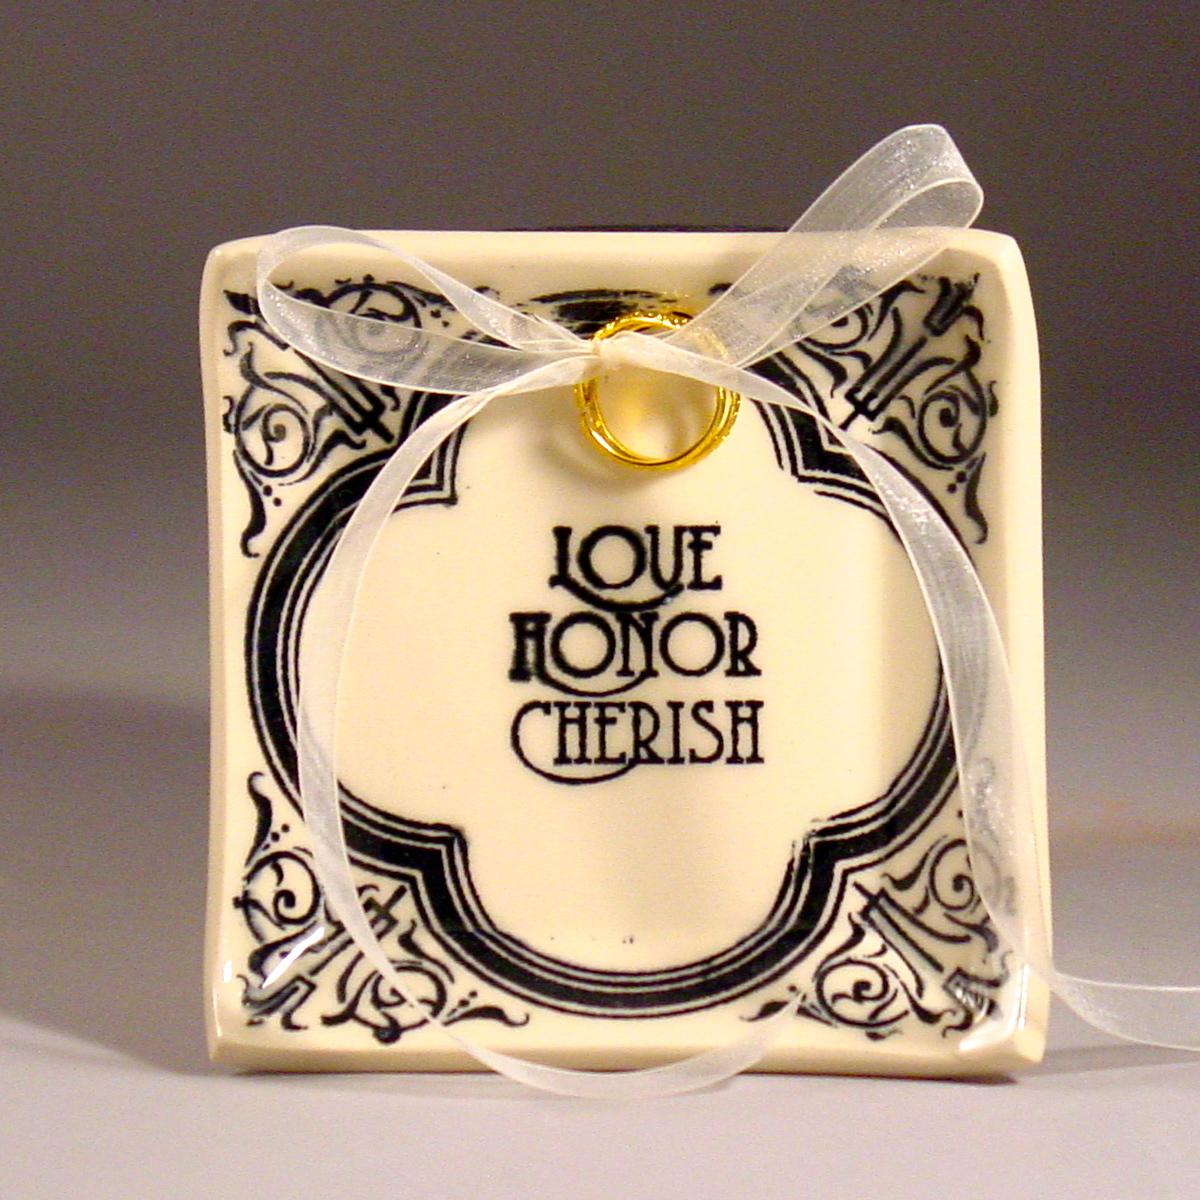 Ceremony, Flowers & Decor, white, black, Ring, Bearer, Cream, Honor, Love, Dish, Filigree, Tray, Dawn dalto ceramics, Chereish